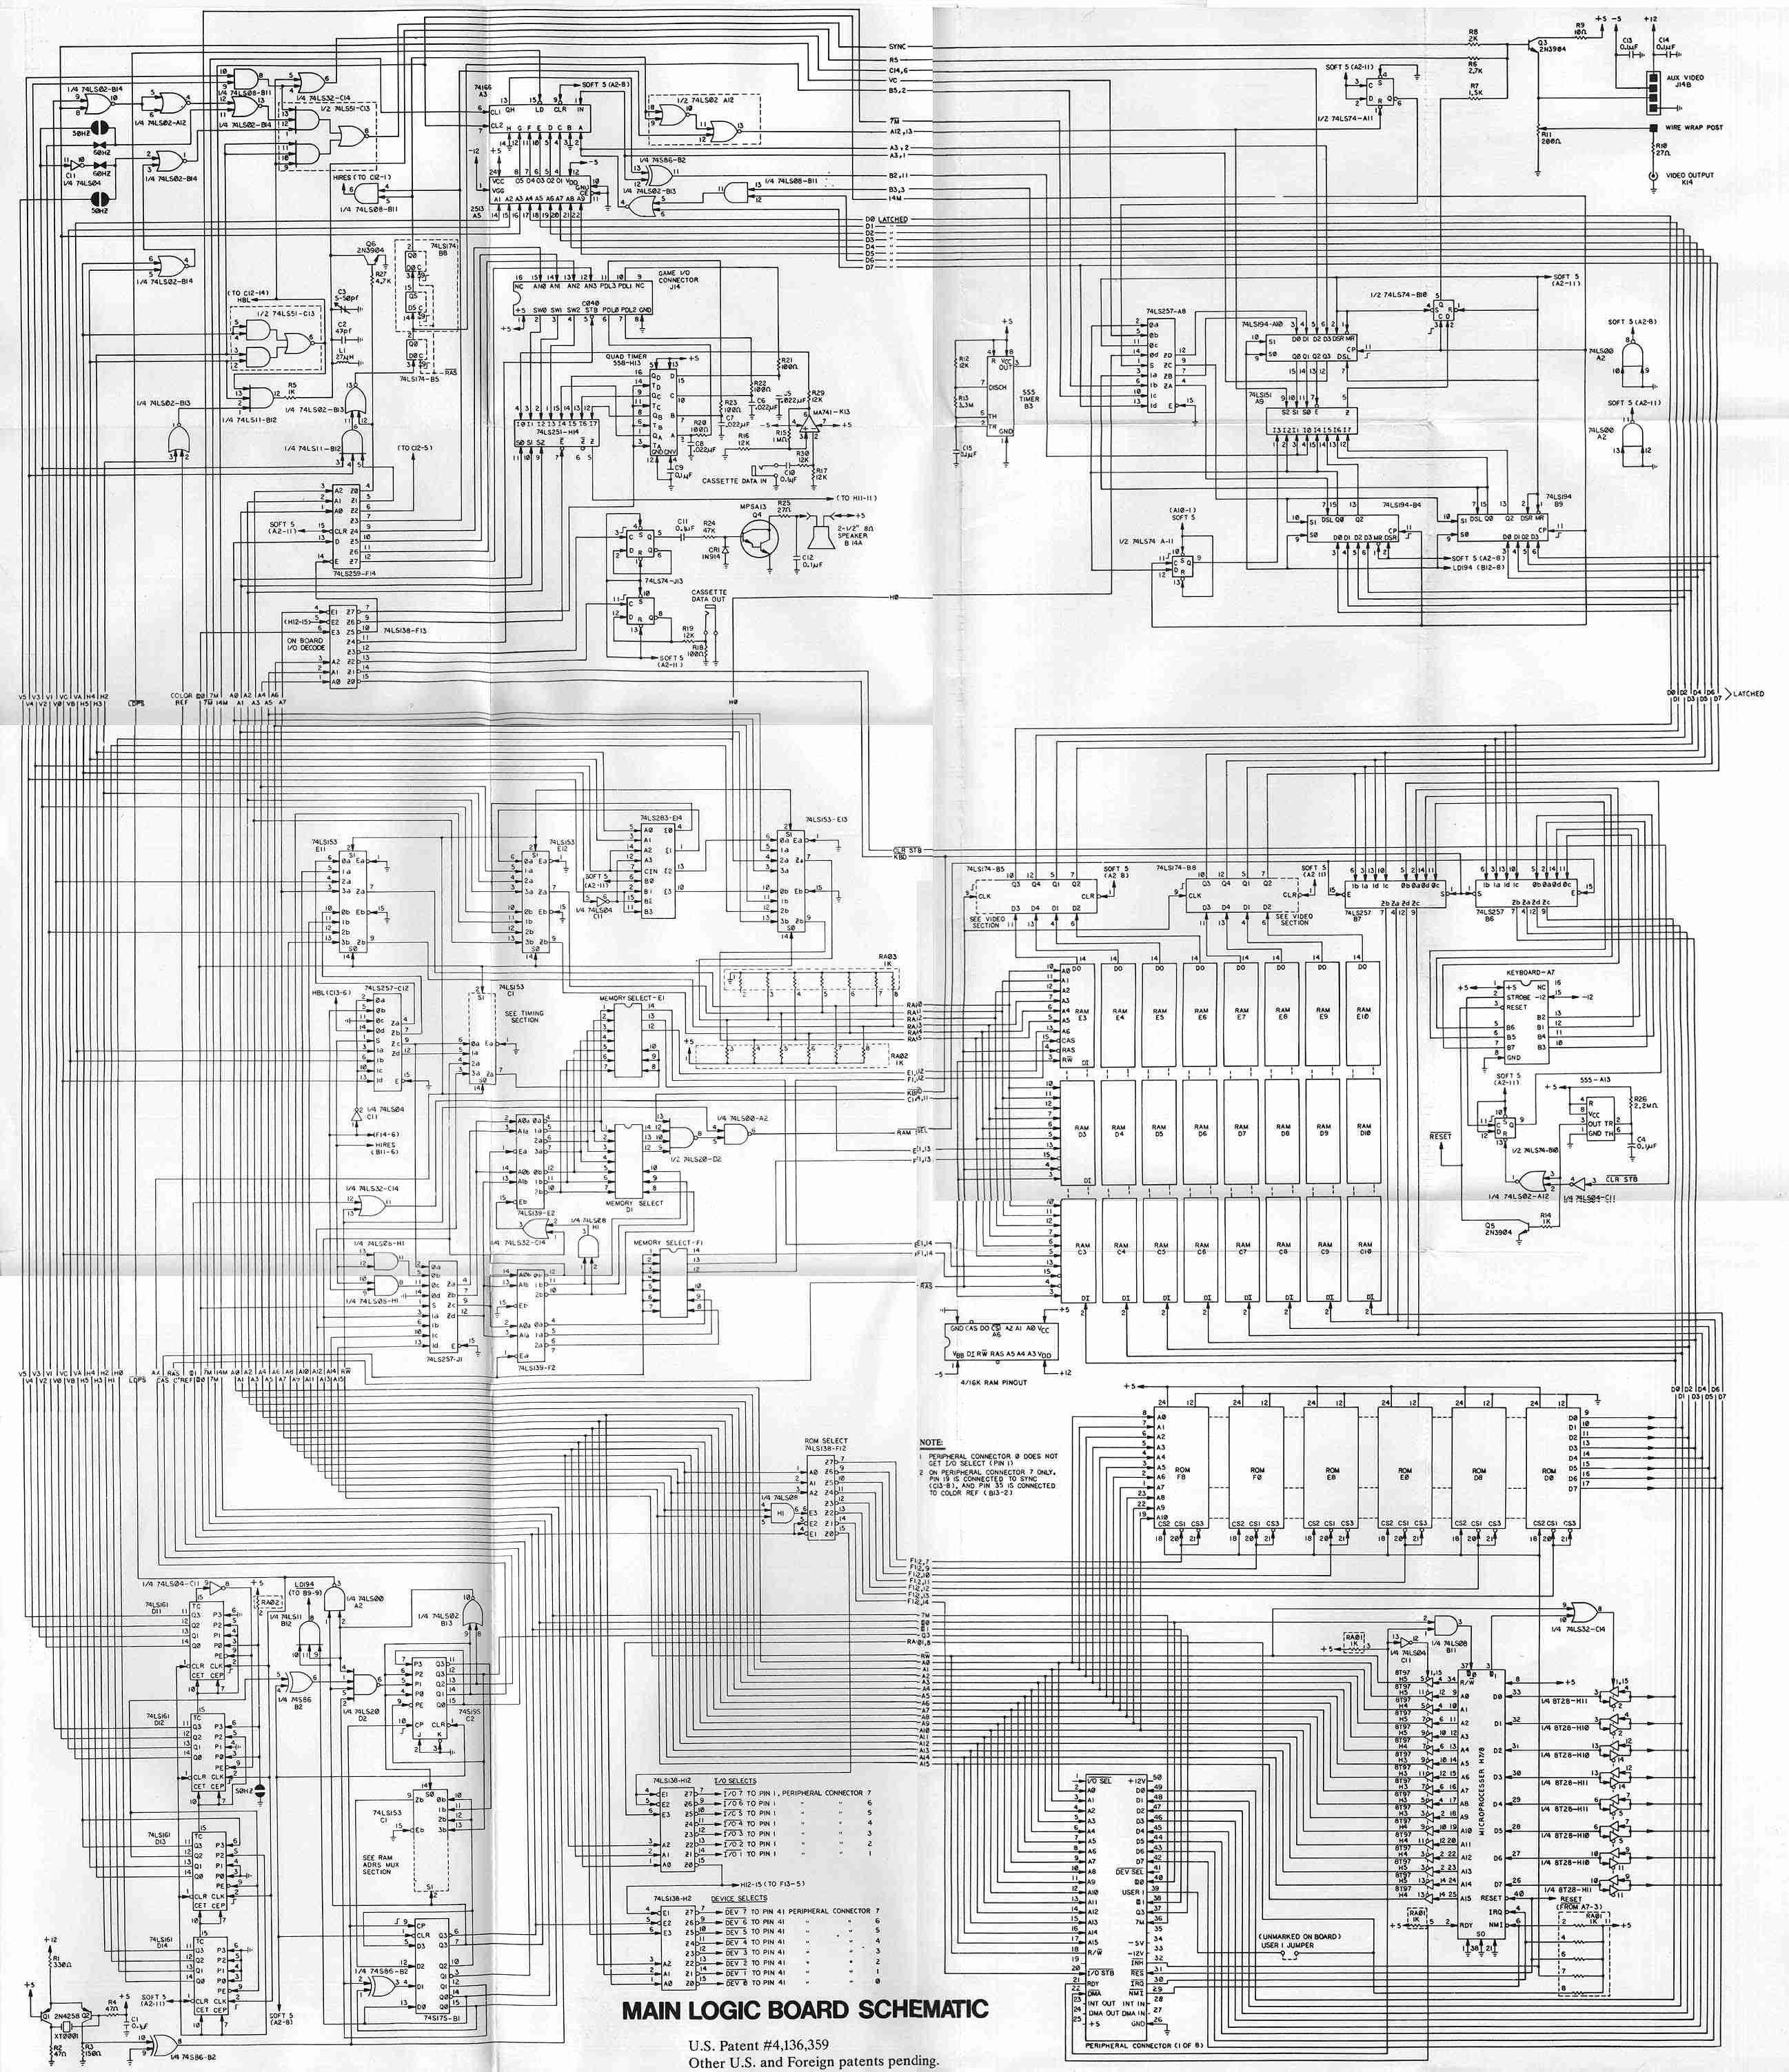 apple 2 main logic board electronic circuit schematic rh pinterest com Diagram Electrical Circuit Electronic Circuit Diagrams